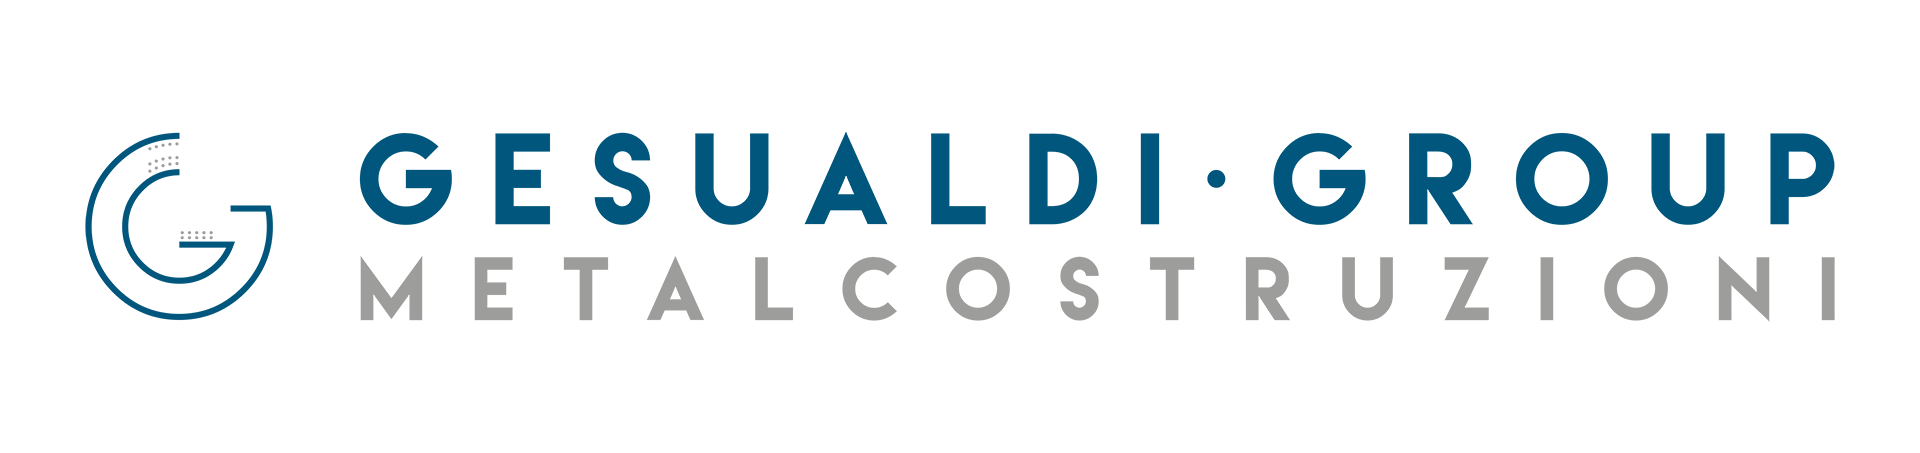 gesualdi-logo